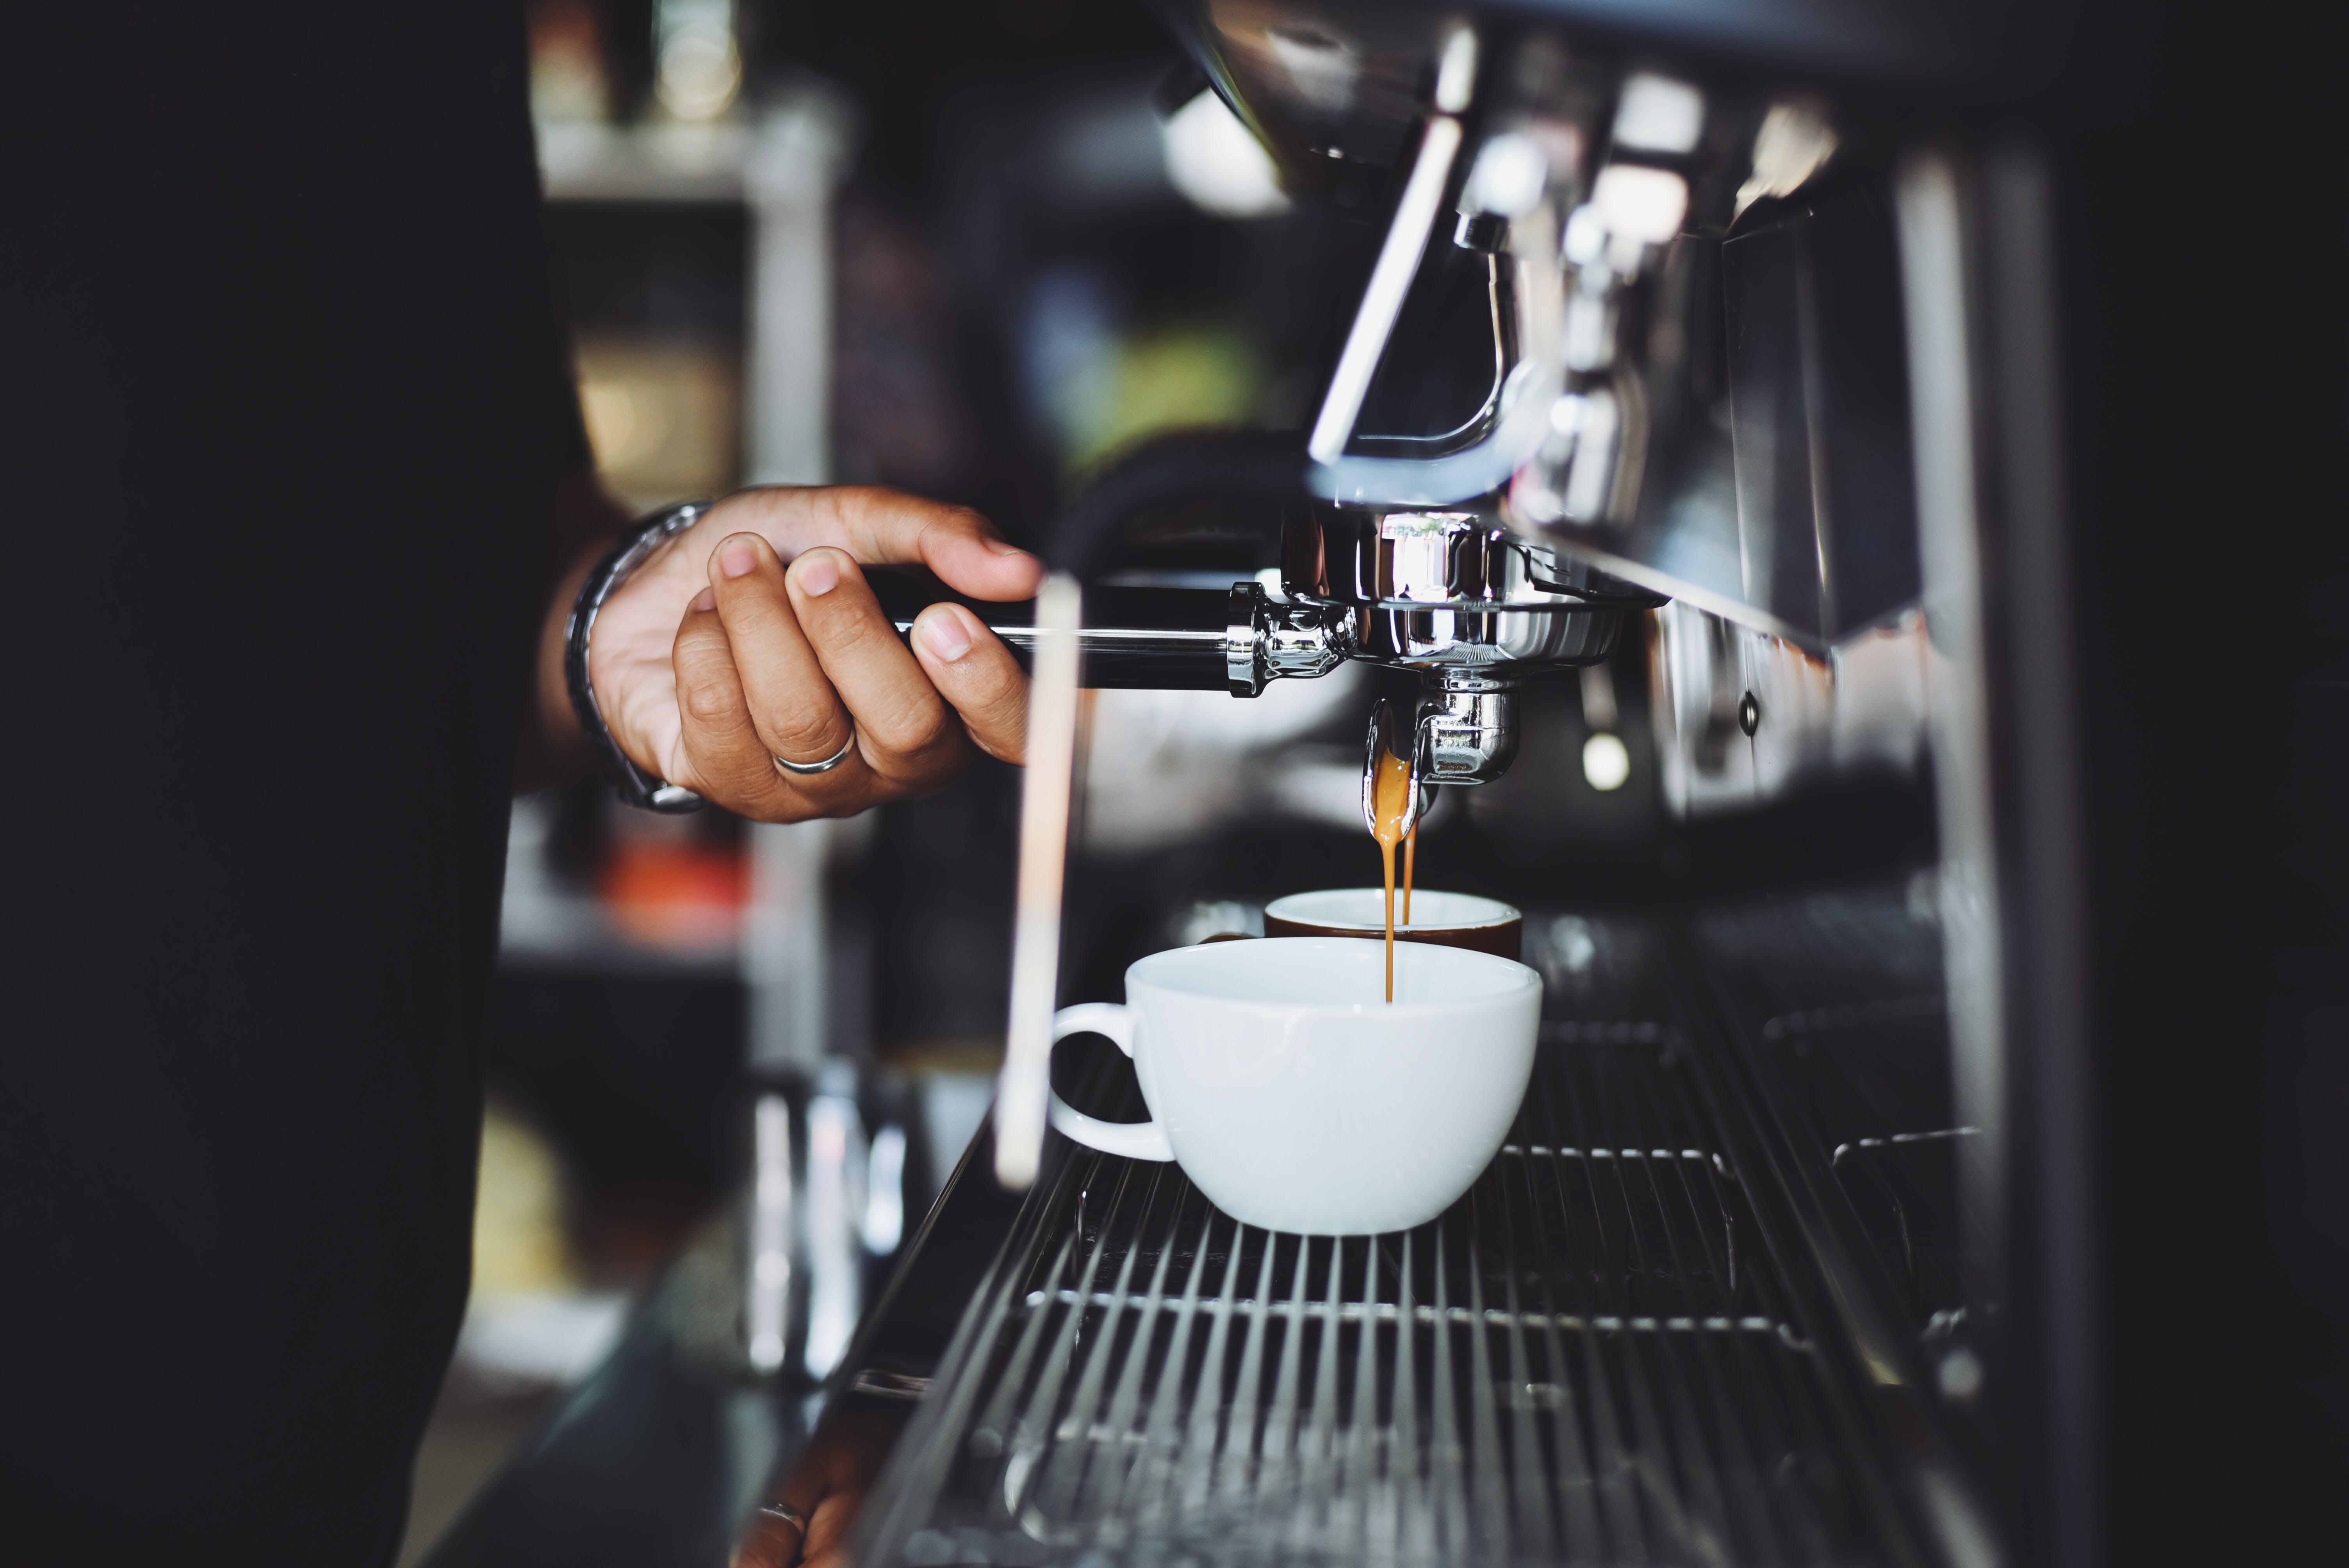 Close-up of Hand Holding Coffee Machine